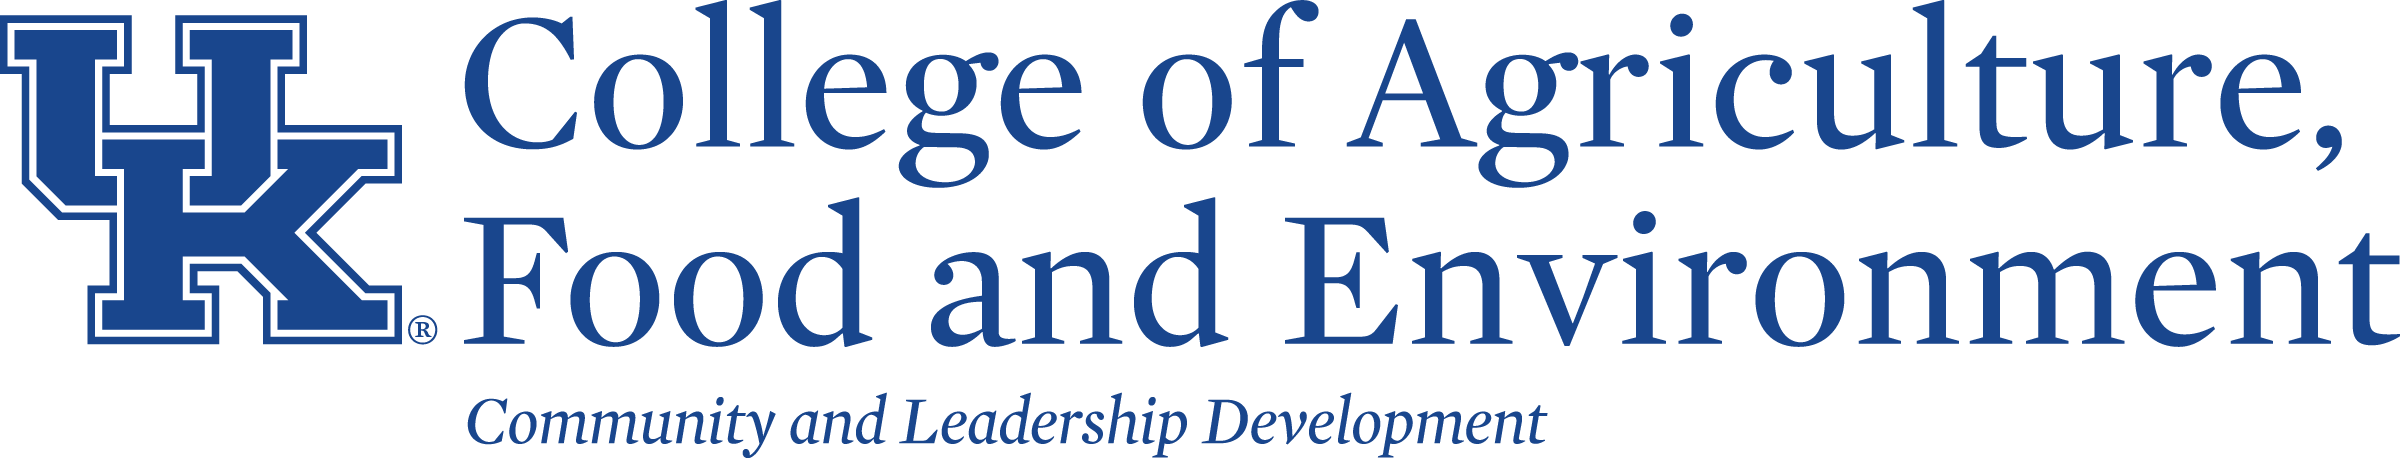 UK Community and Leadership Development logo